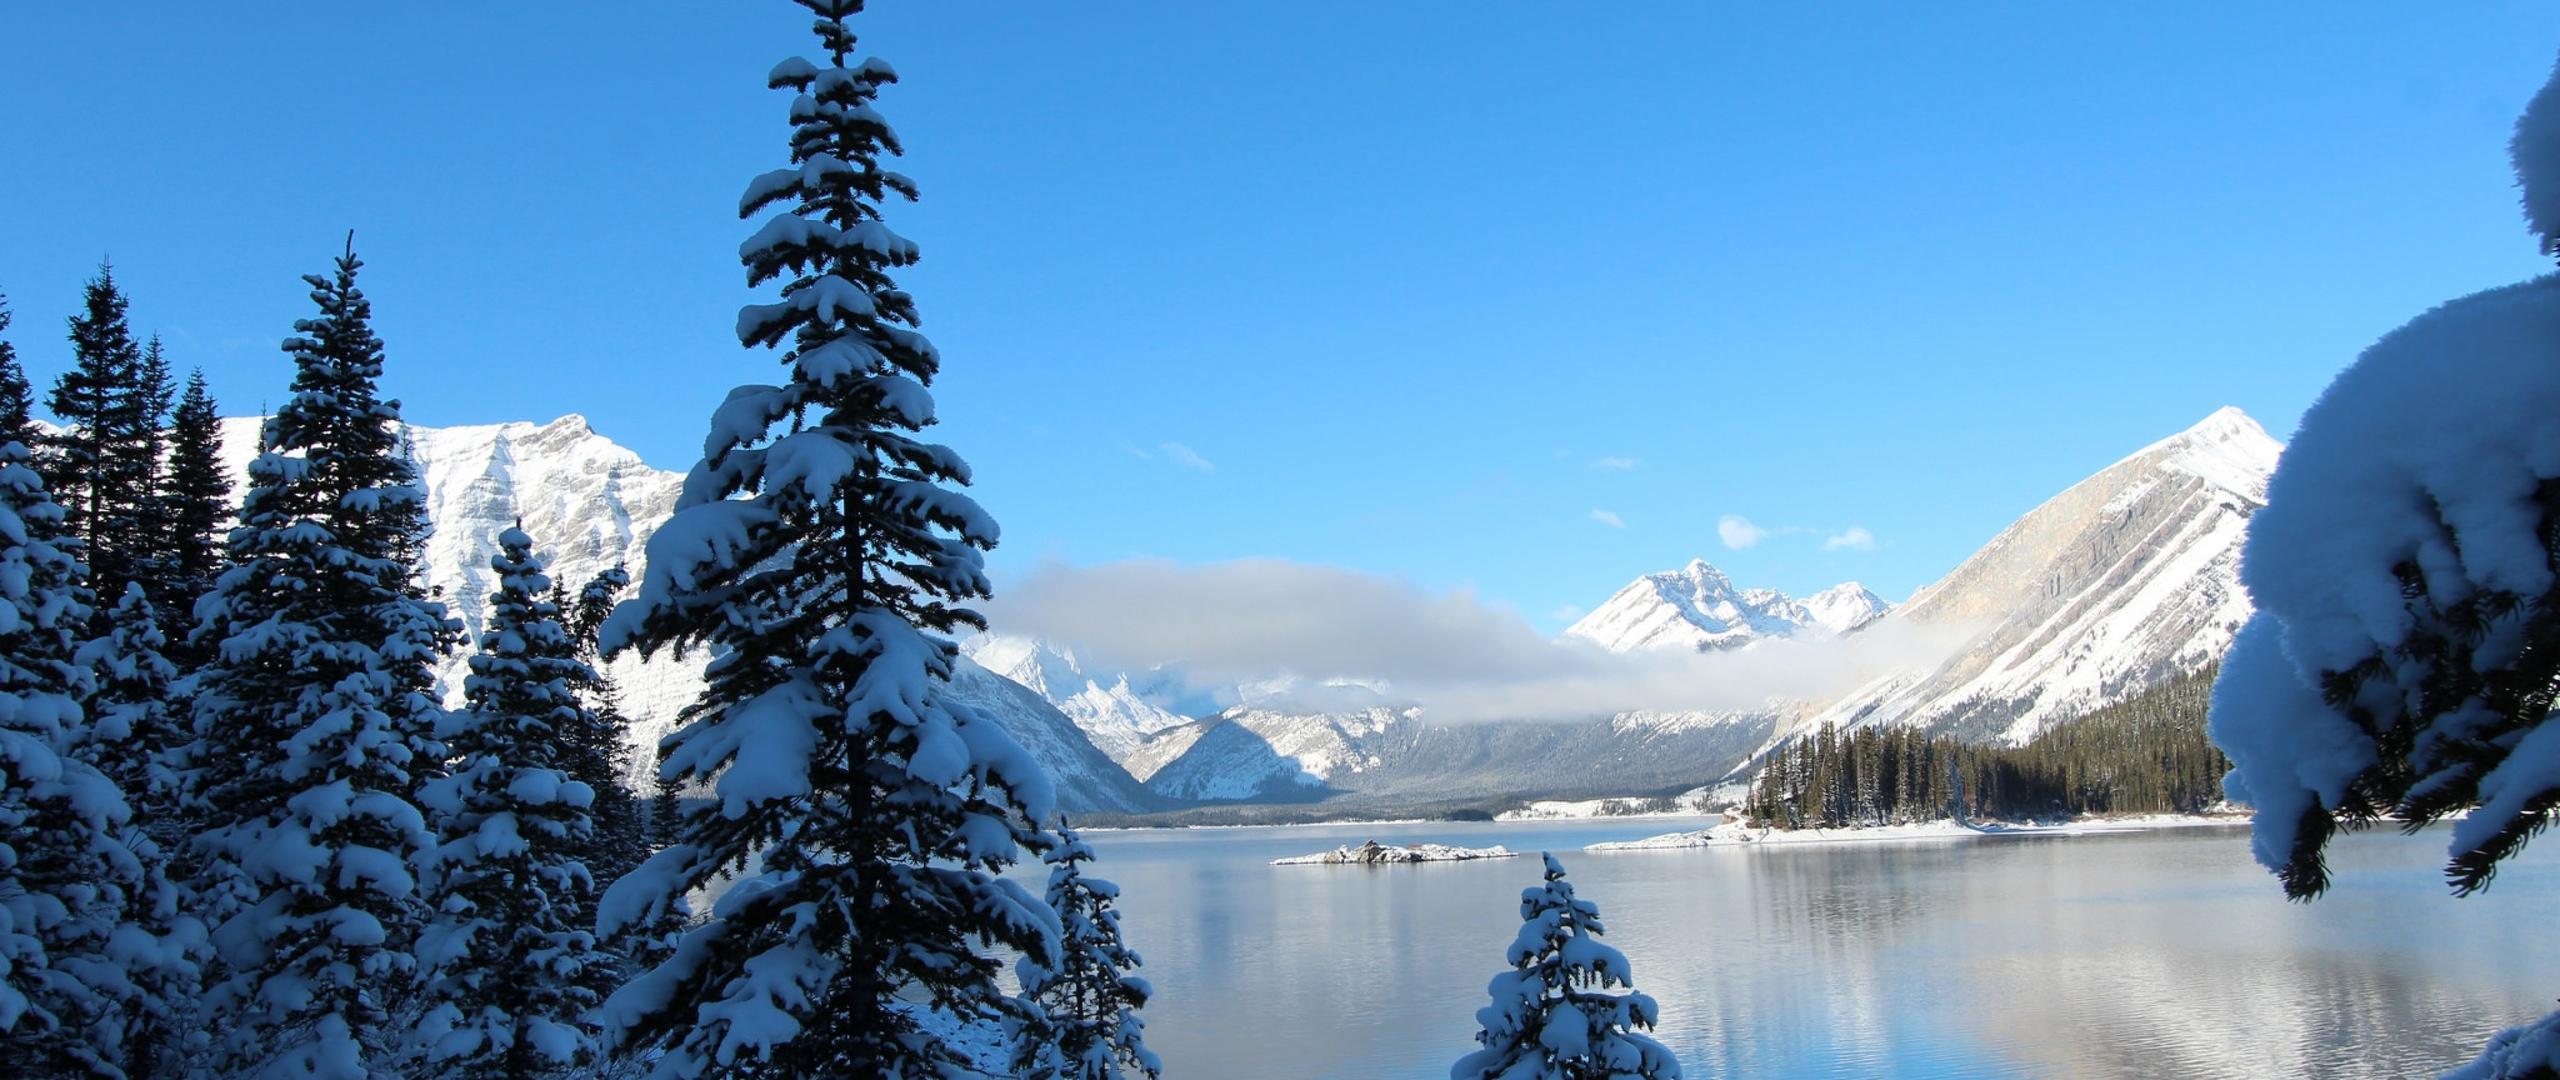 winter-snow-lake-mountain.jpg